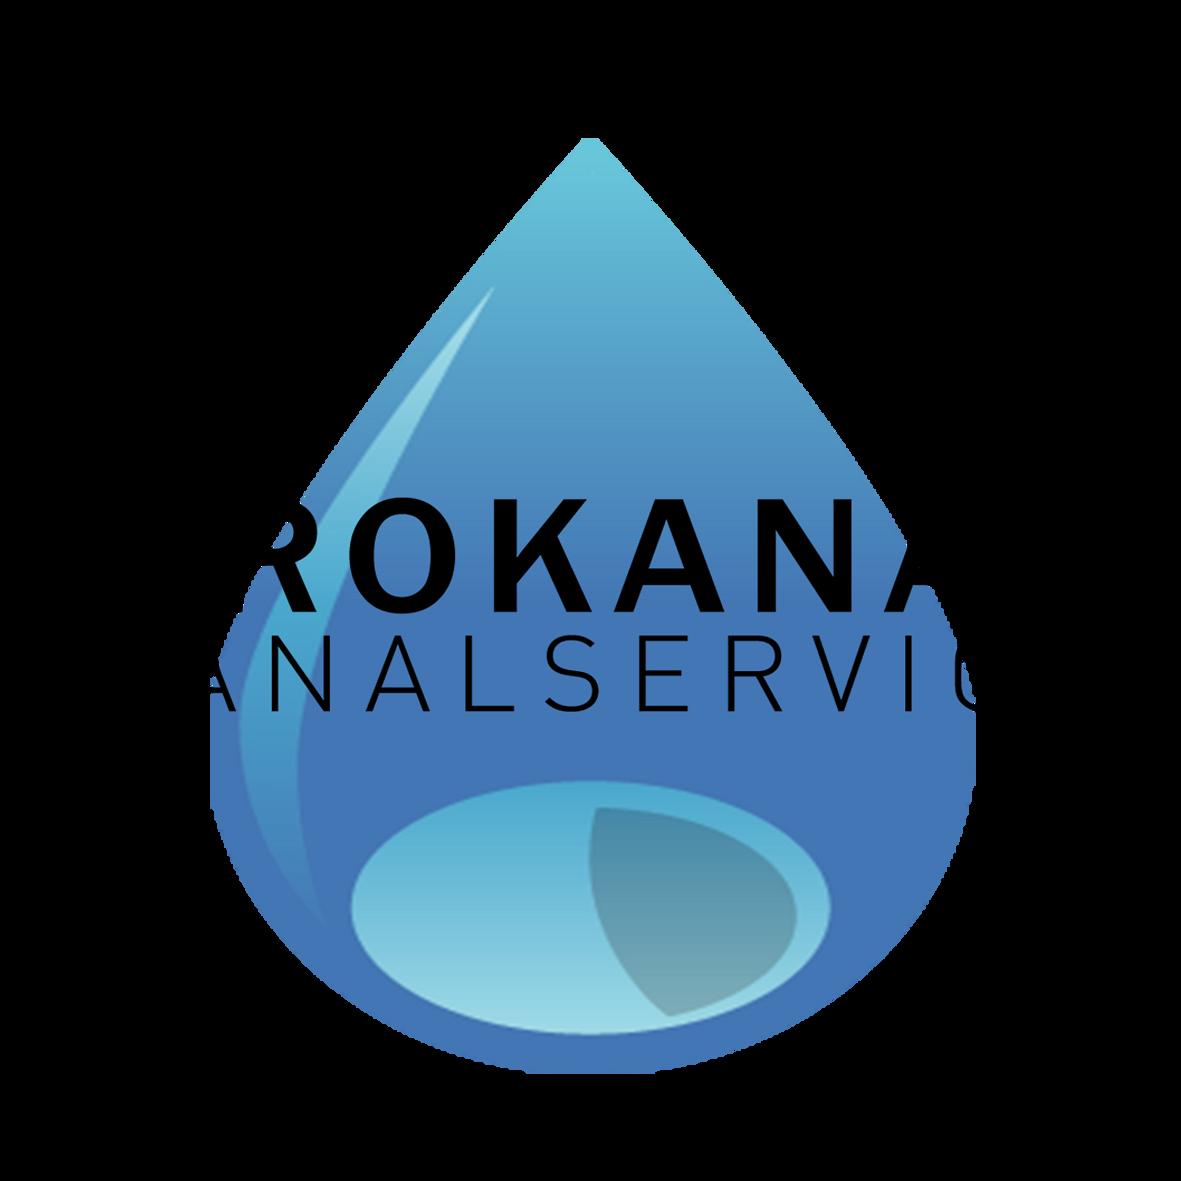 Prokanal Kanalreinigung GmbH